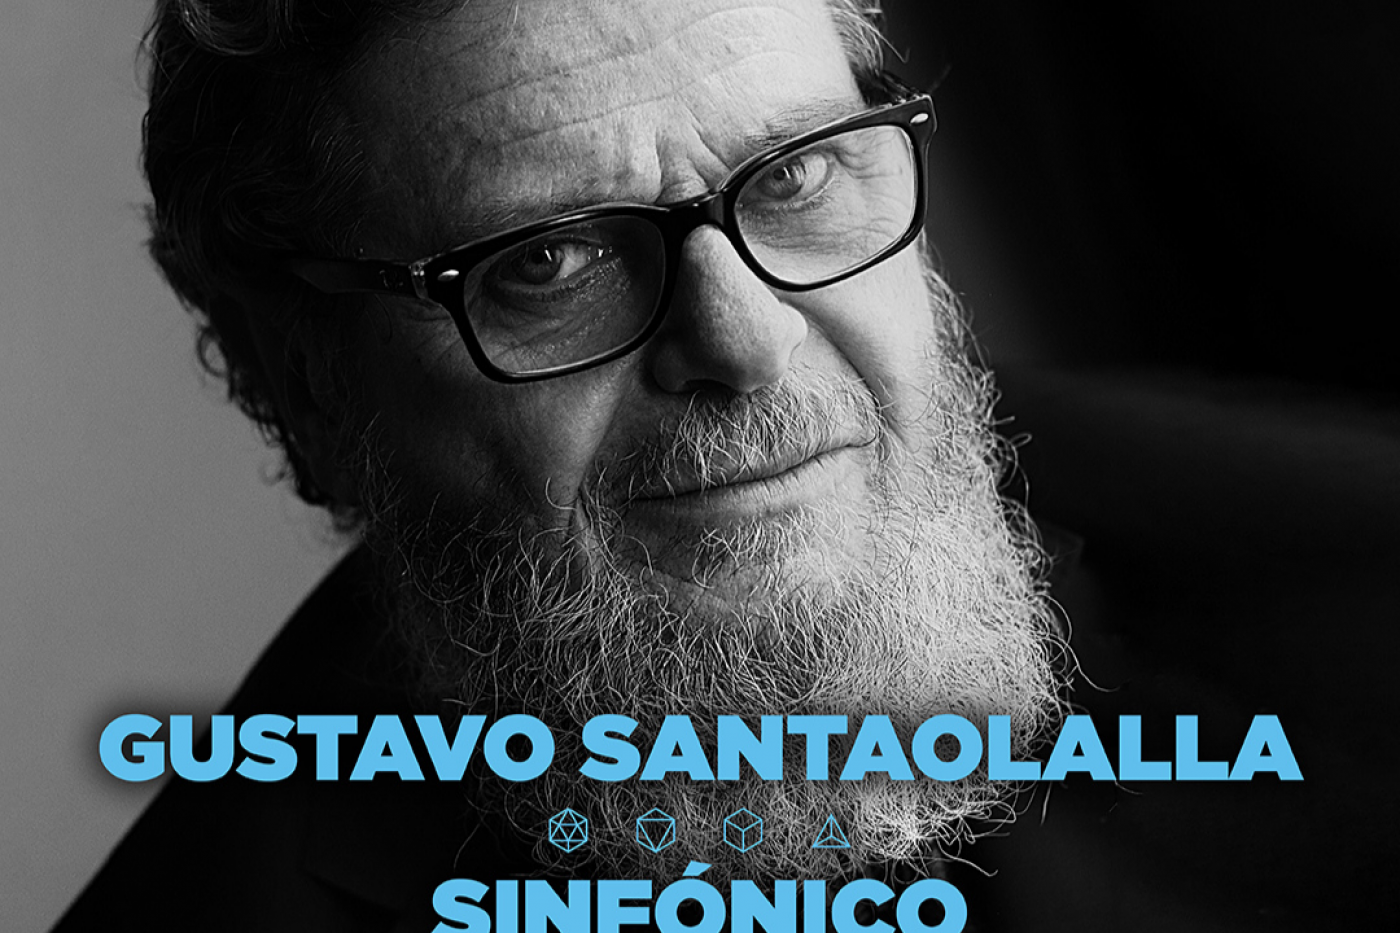 Gustavo_santaolalla_madrid